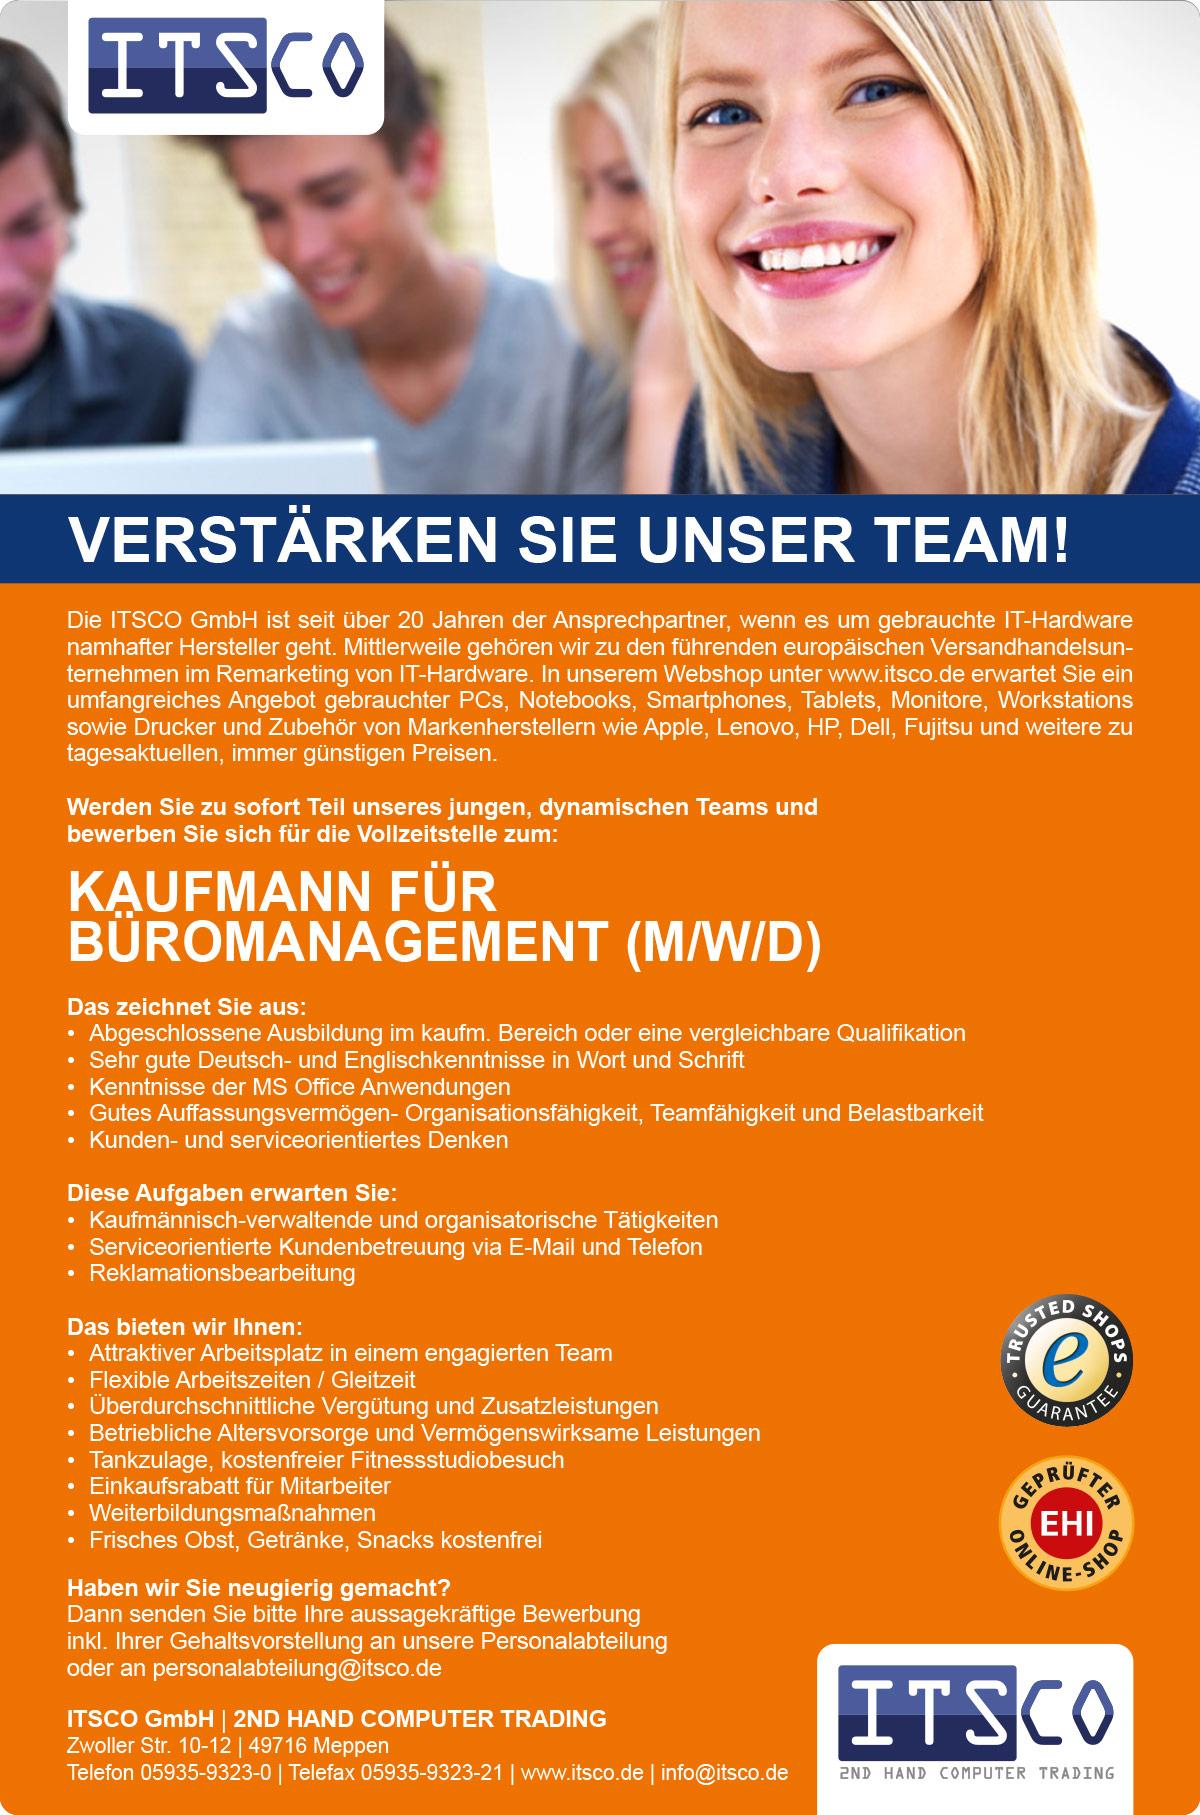 Kaufmann für Büromanagement (m/w/d)